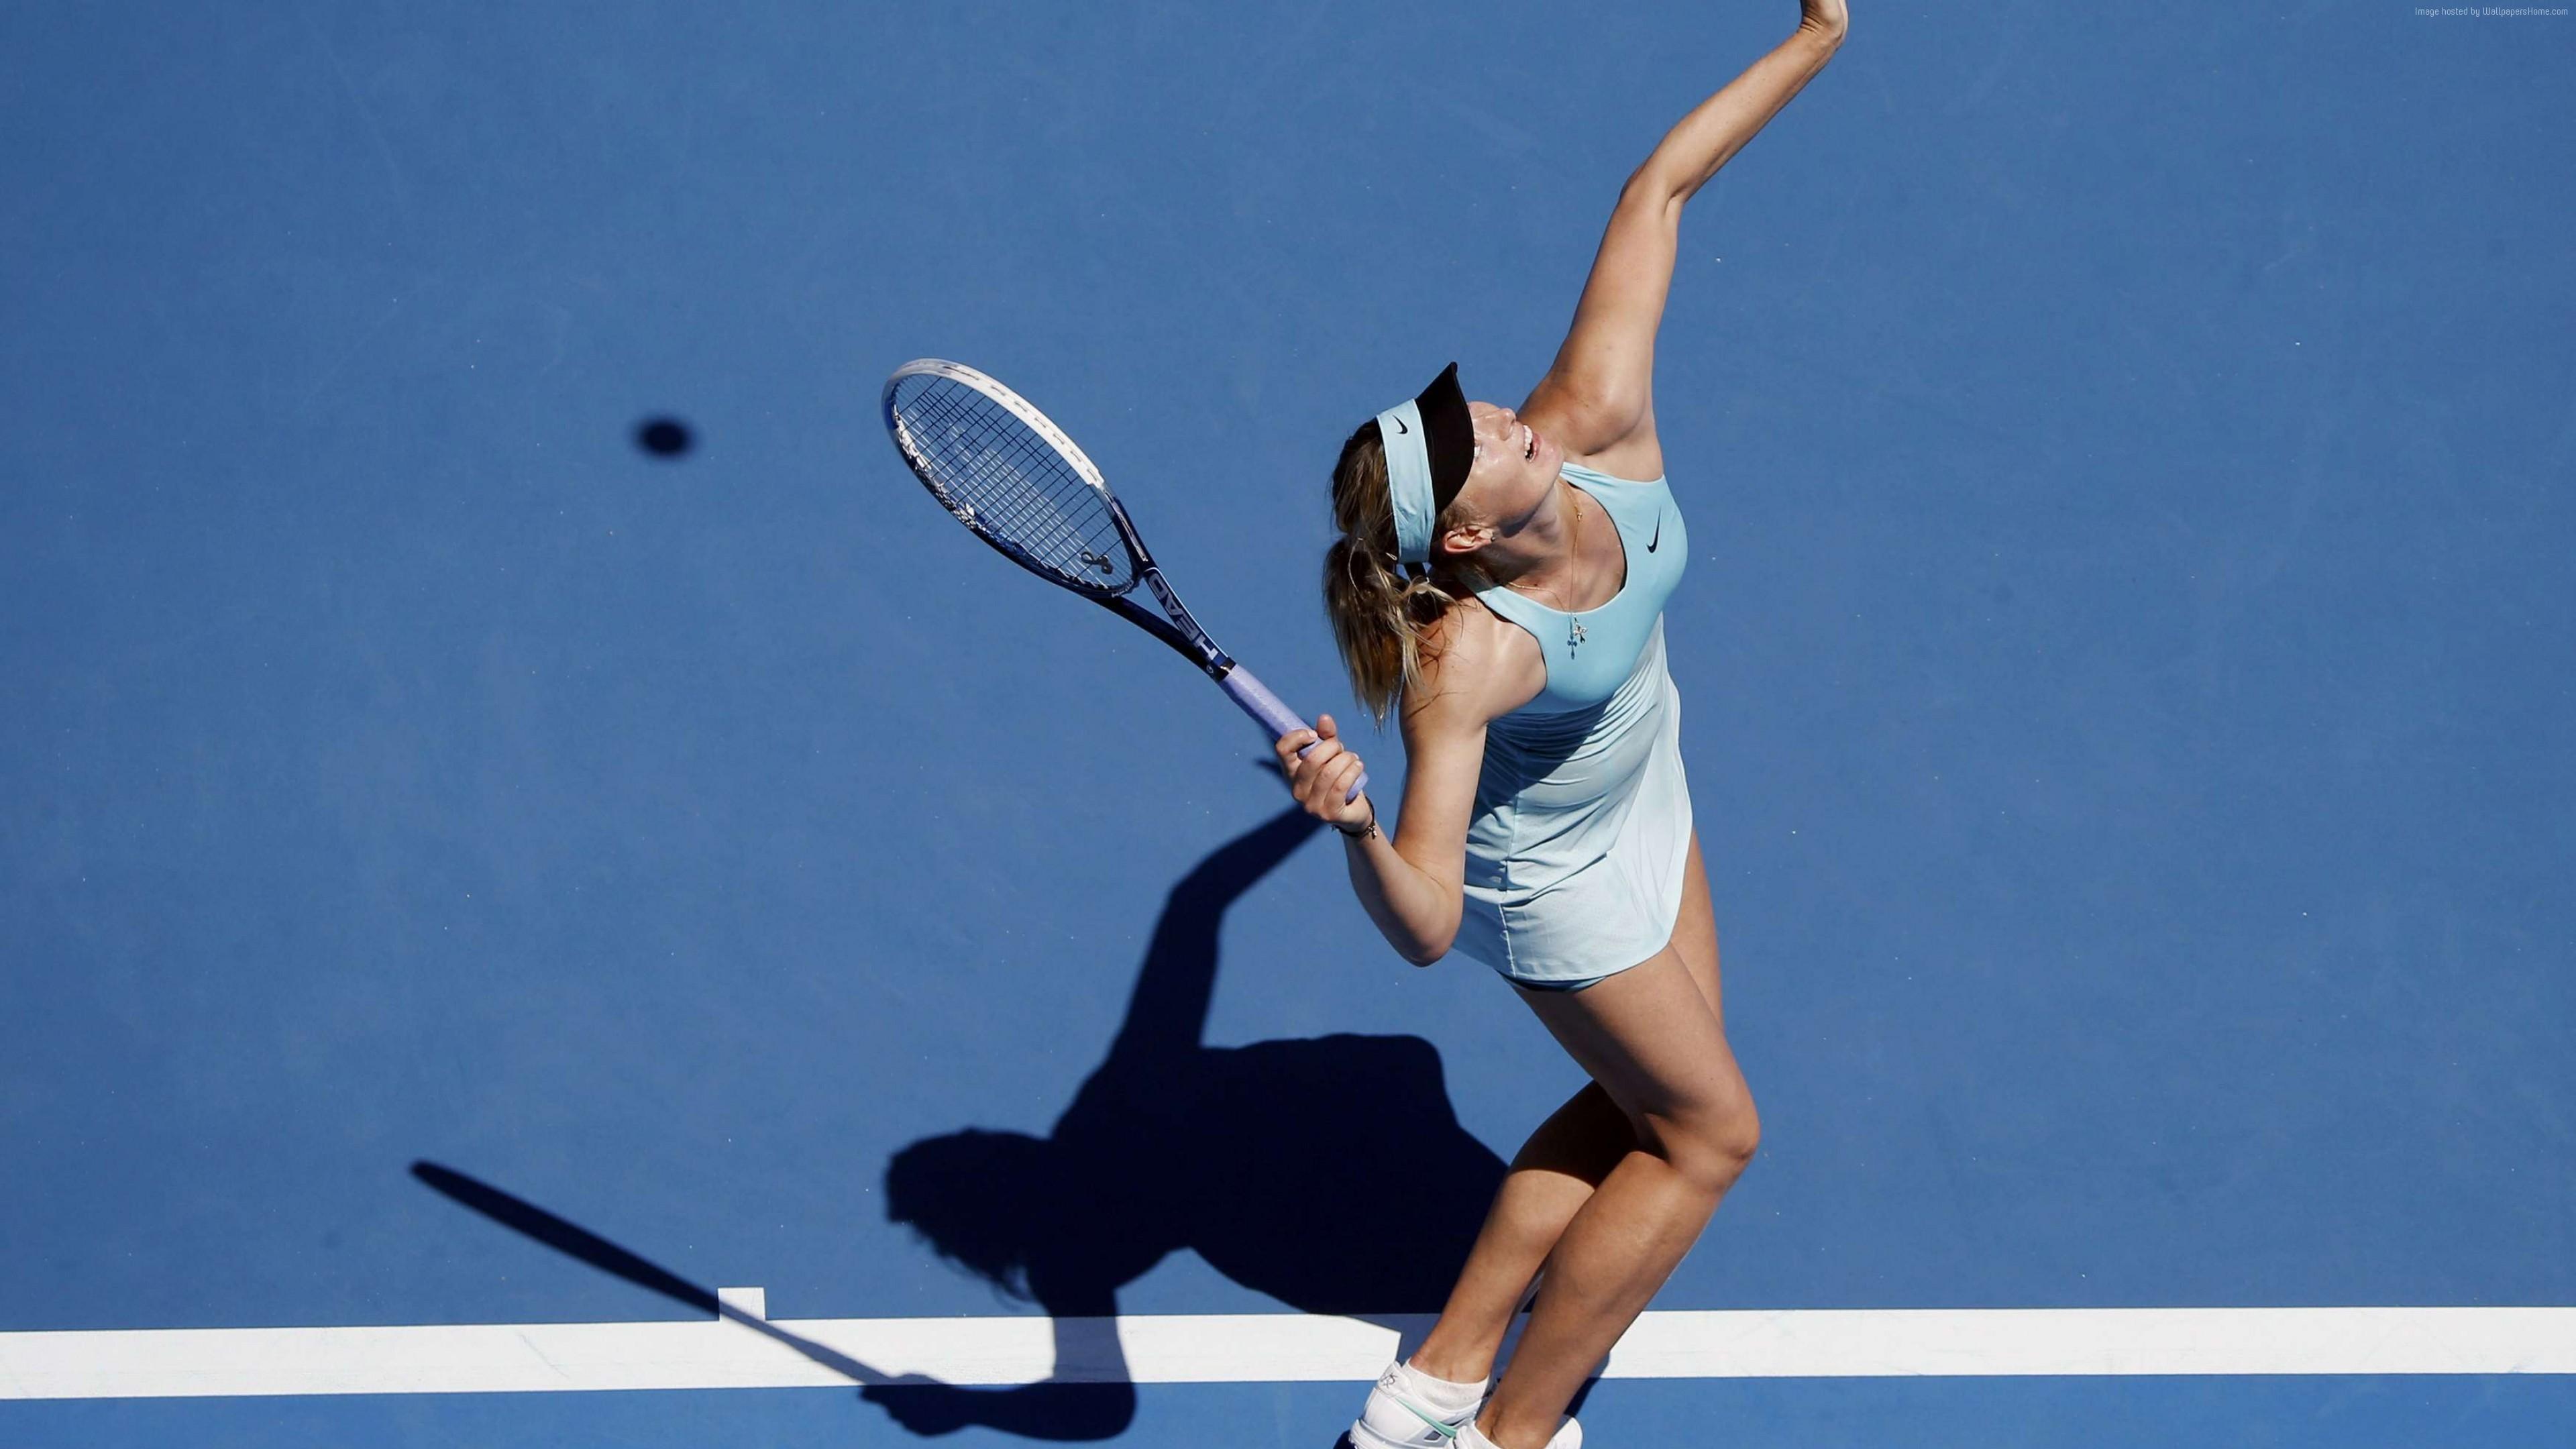 Wallpaper Tennis Sportswoman Maria Sharapova Court Racket Sport Wallpaper Download High Resolution 4k Wallpaper